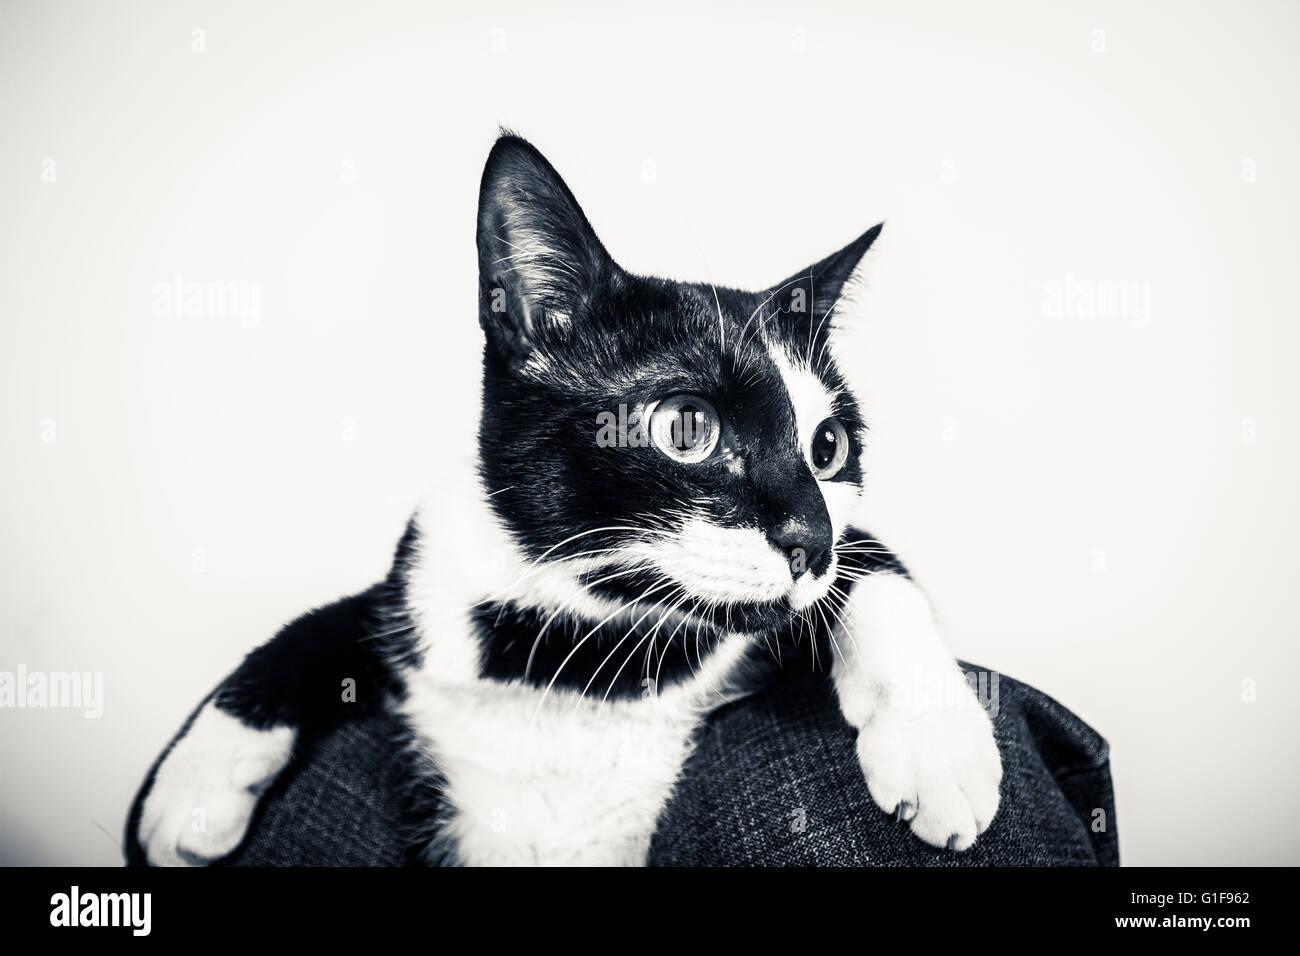 Cute portrait of a Manx cat - Stock Image